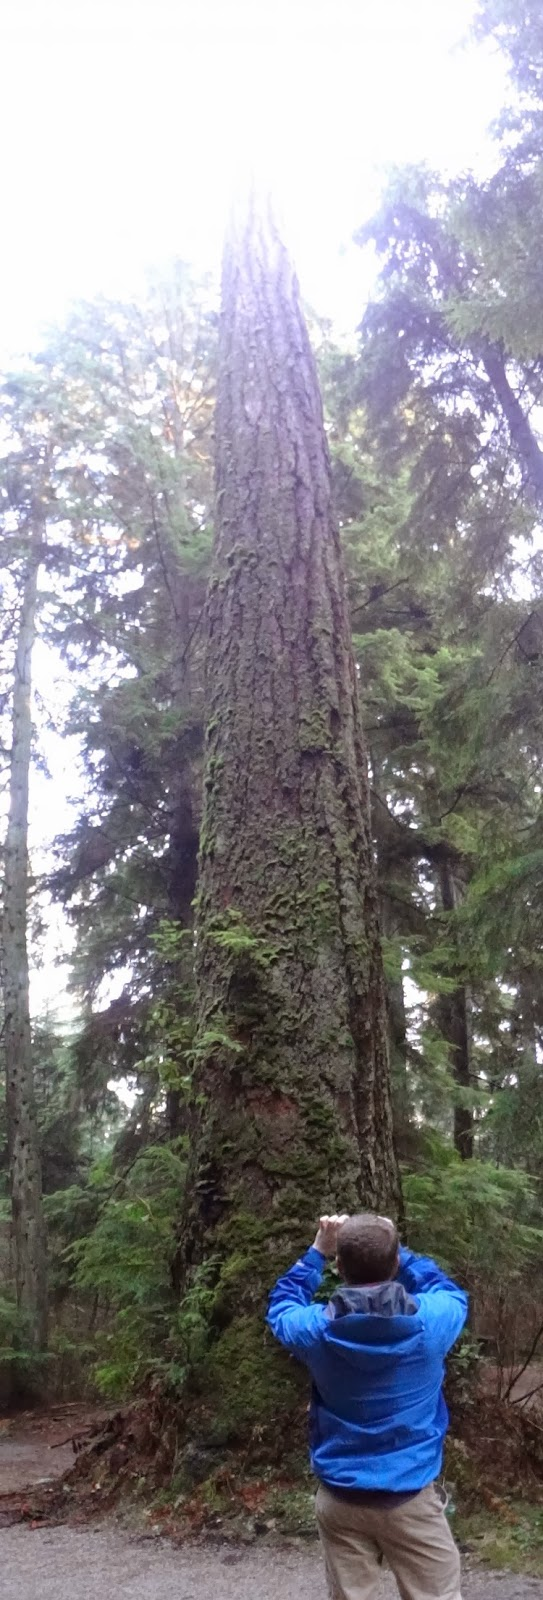 Huge tree in Vancouver's Stanley Park